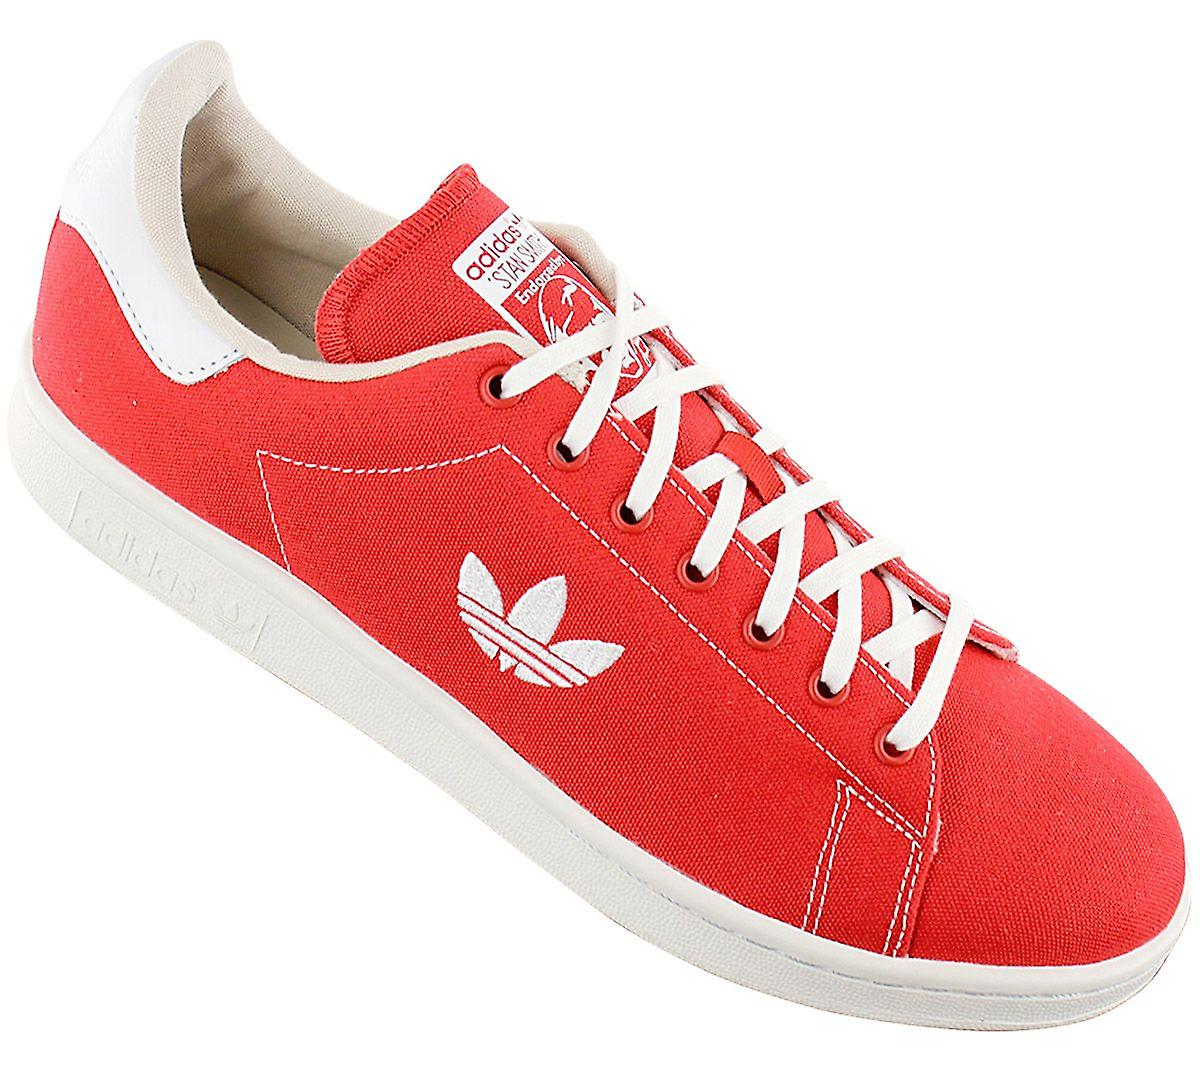 Adidas Originals Stan Smith - Herren Schuhe Canvas Rot B37894 Sneakers Sportschuhe